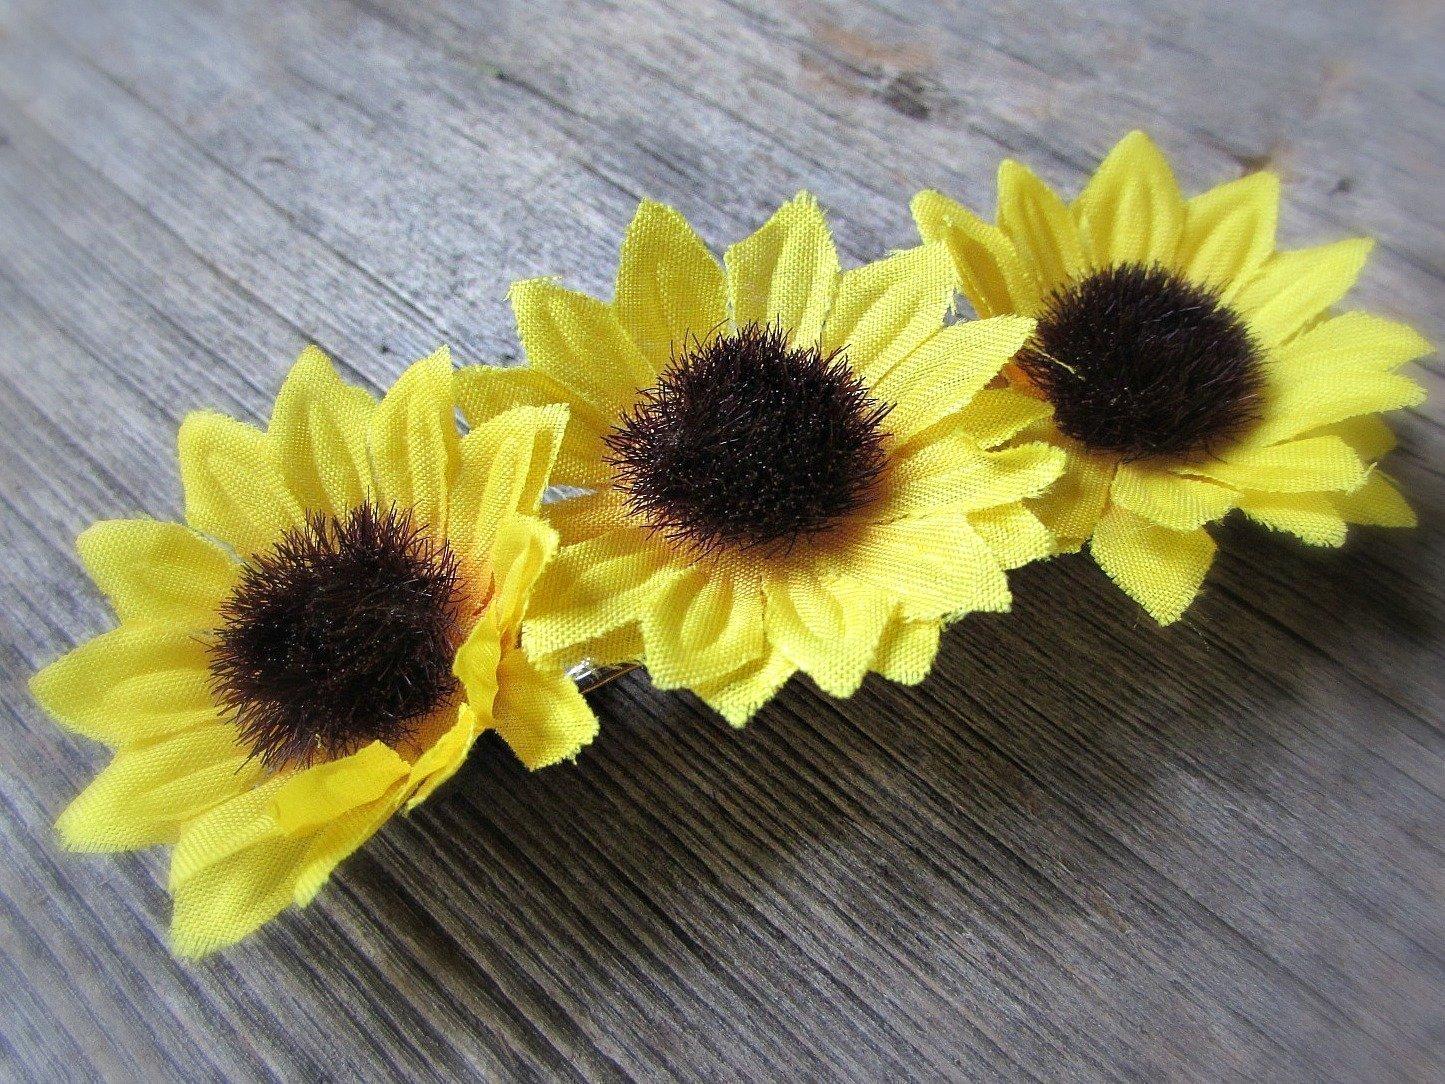 Silk Sunflower Hair Barrette- Hair Accessories for Boho Wedding Prom- Bride Bridesmaids Flower Girl Gift